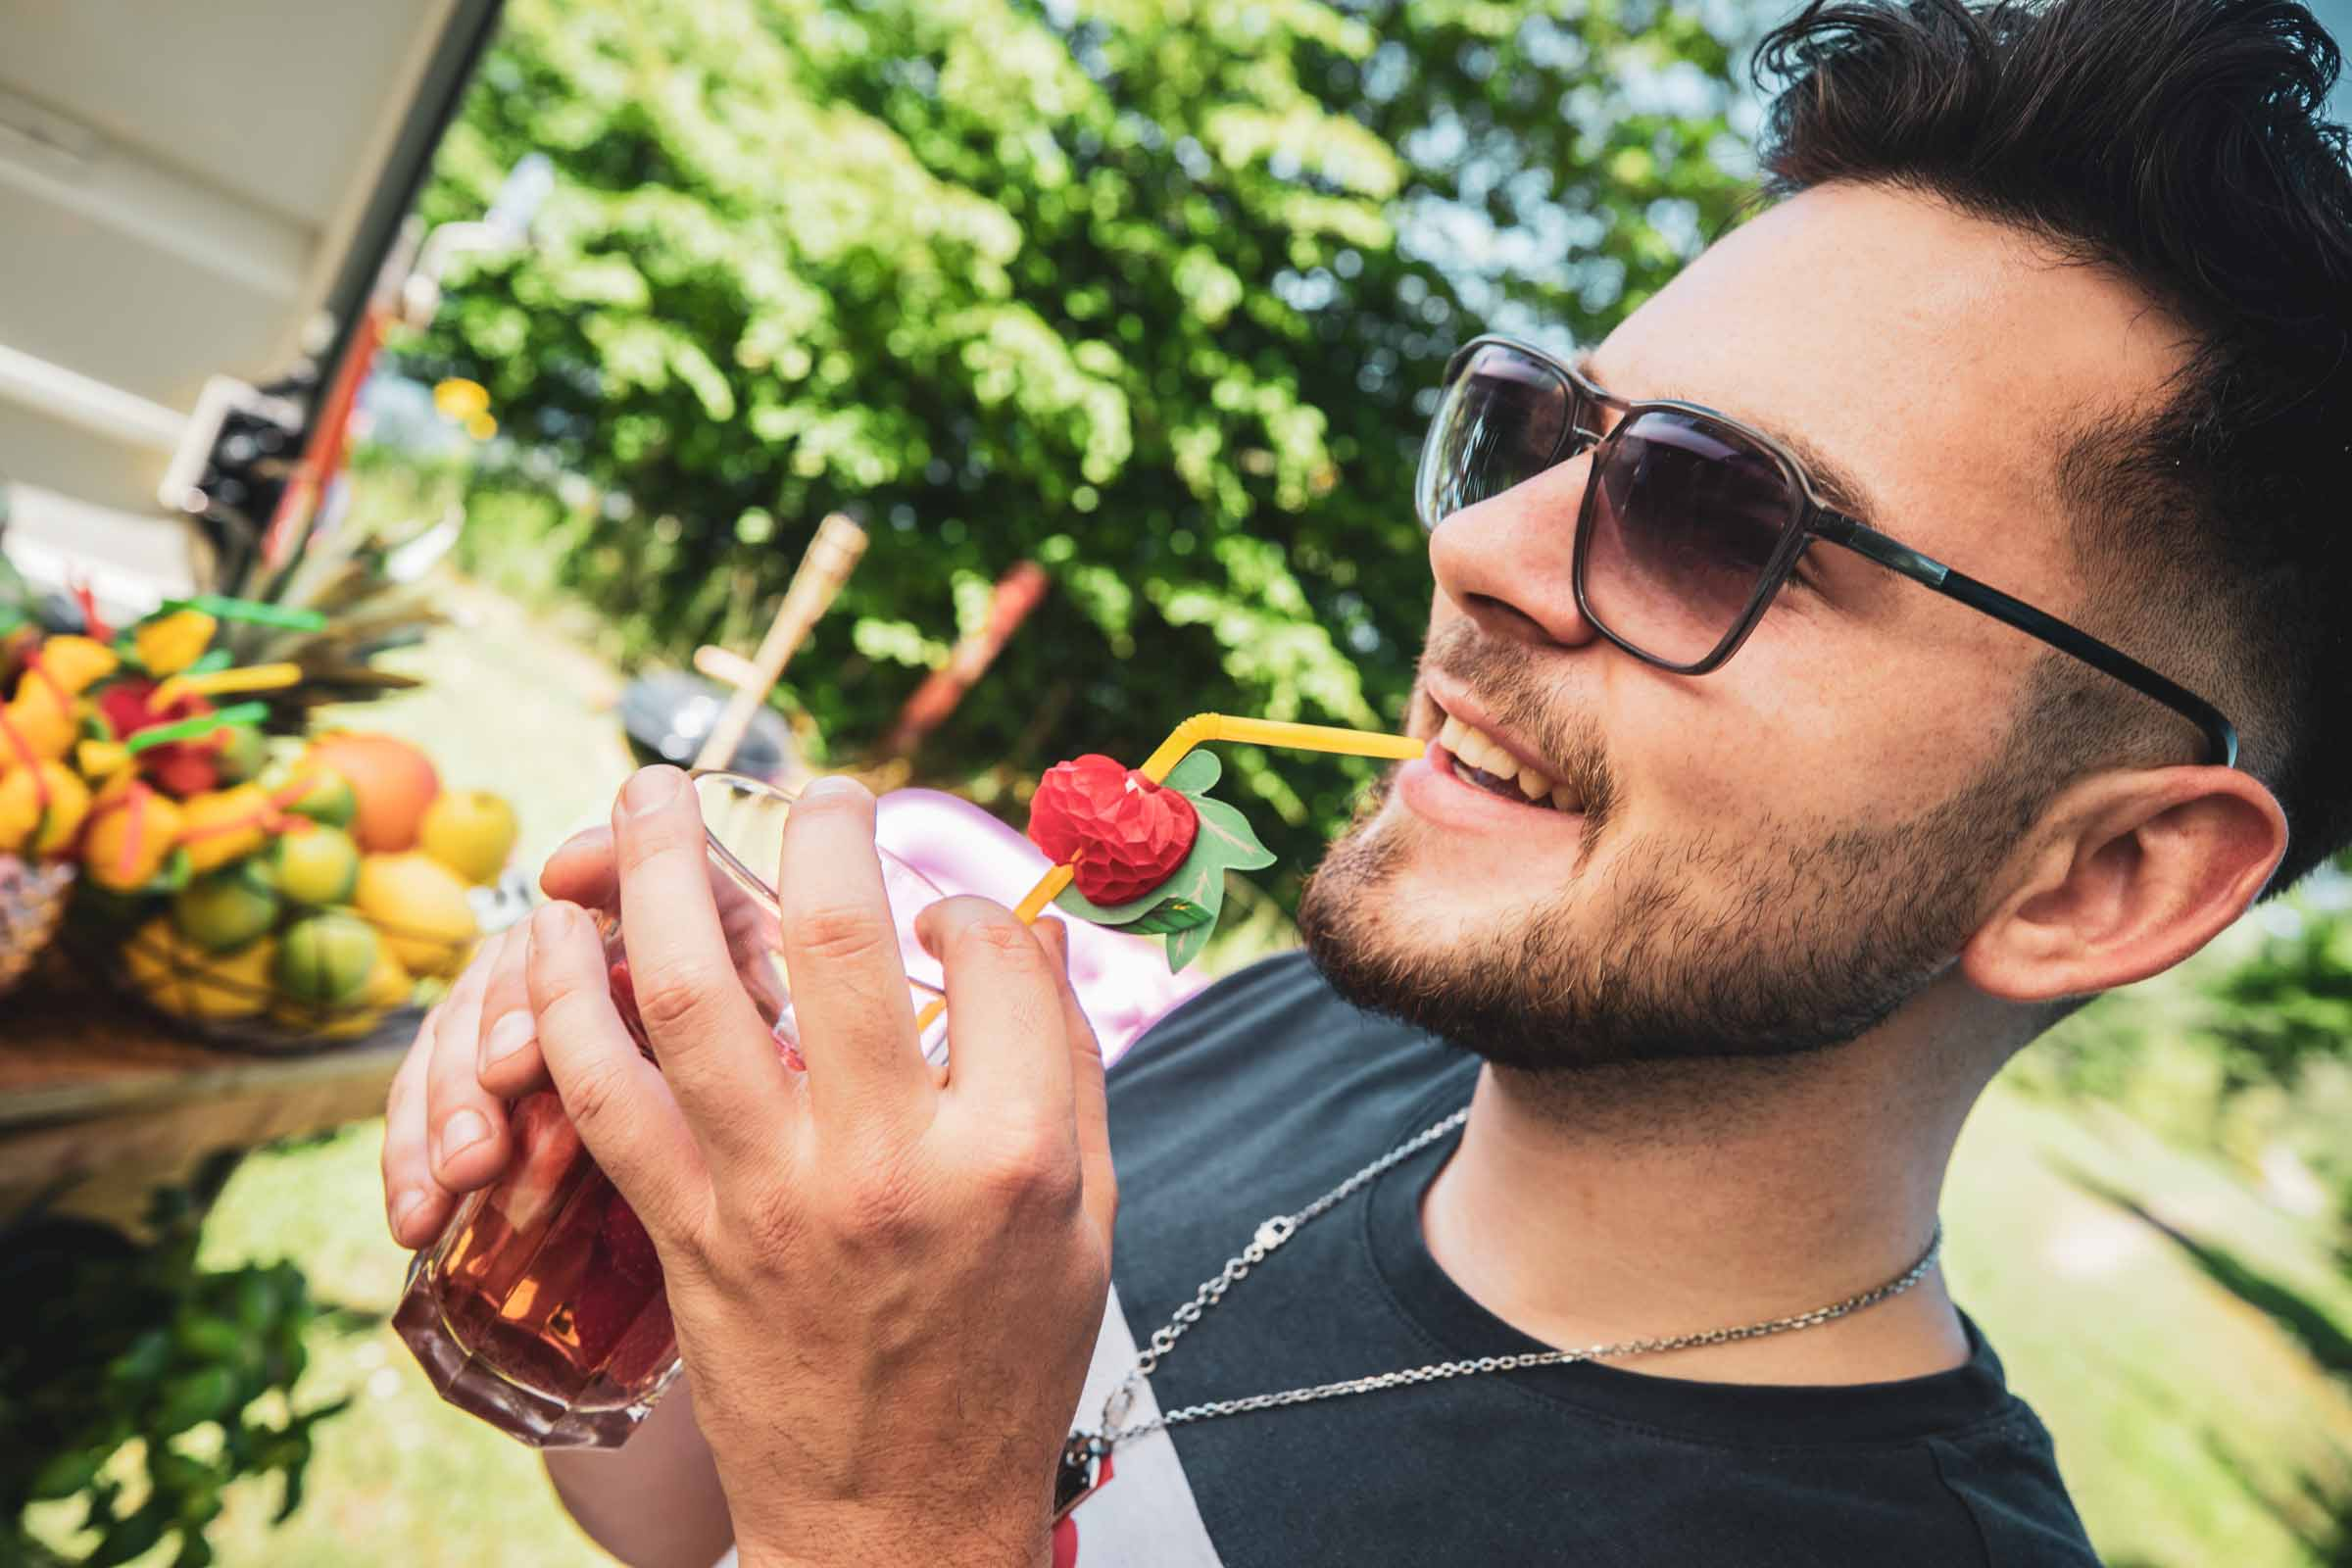 Barformat | Mobile | Bar | Cocktailservice | Hannover | Getränke | Catering | Cocktails | Wein | Aperitif | Gin | Kaffee | Softdrinks | Standesamt | Hochzeit | Messe | Firmenfeier | Buchen | Mieten | Anfragen